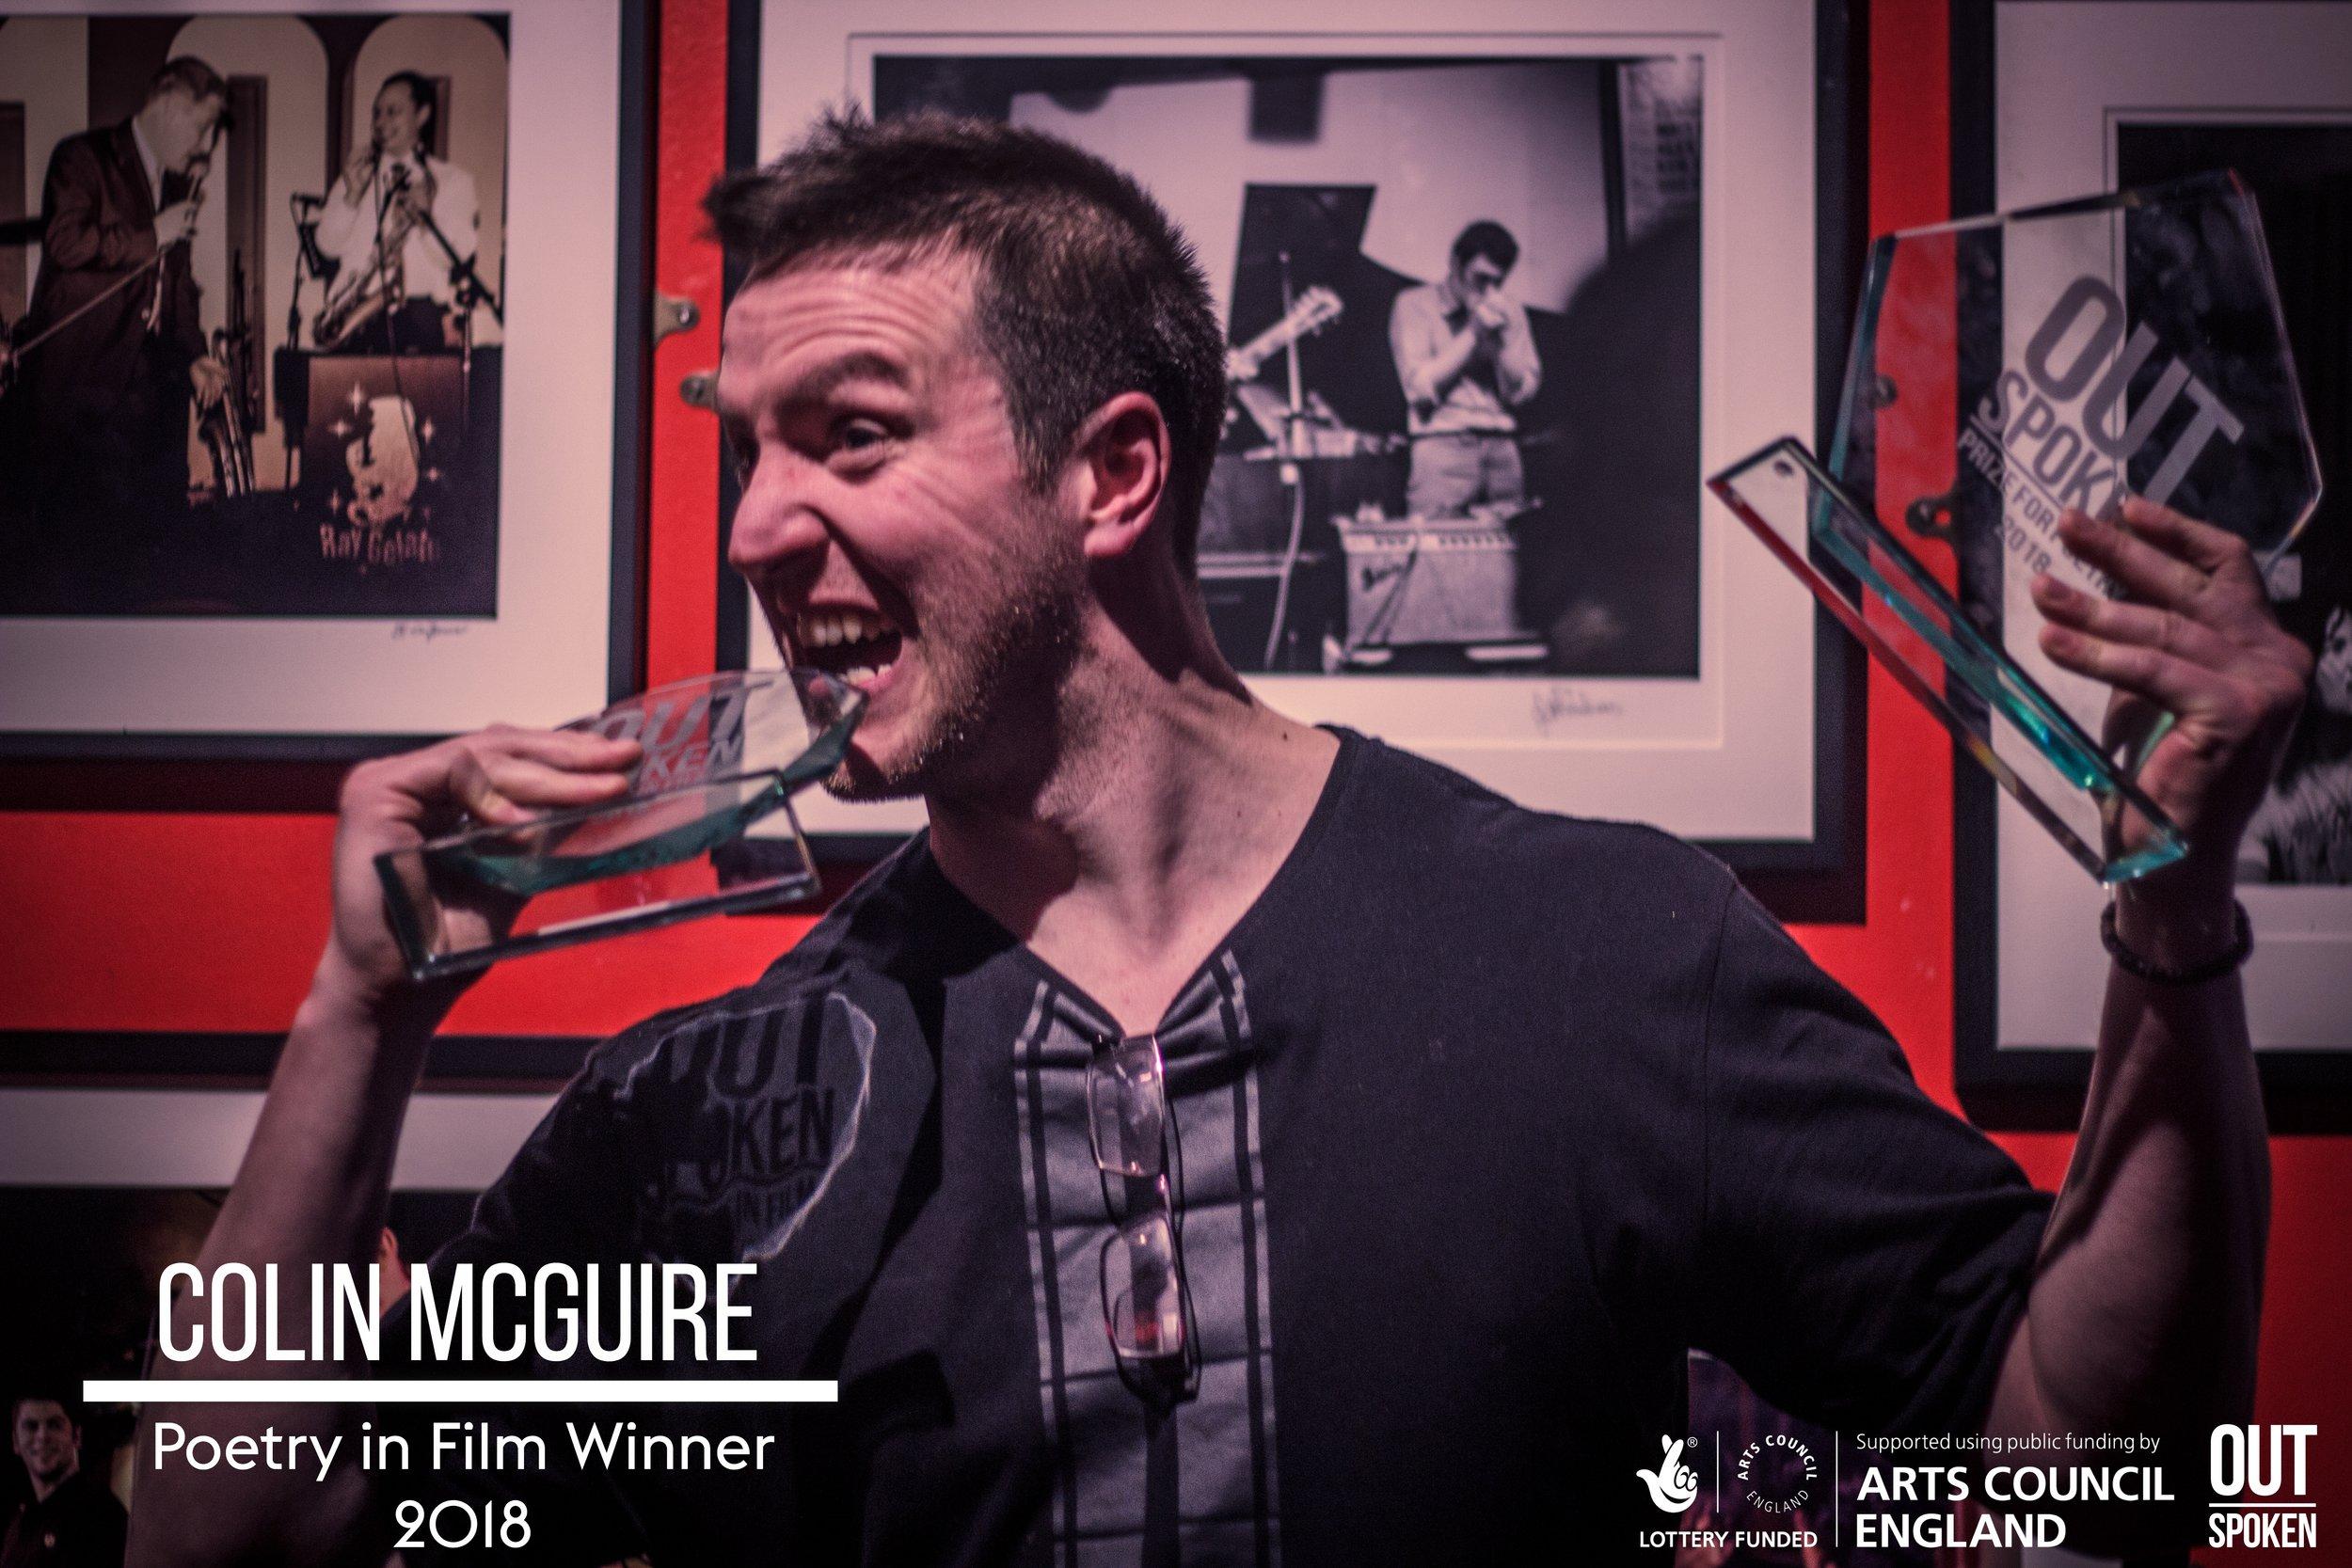 Film Winner: Colin McGuire - Click to watch film